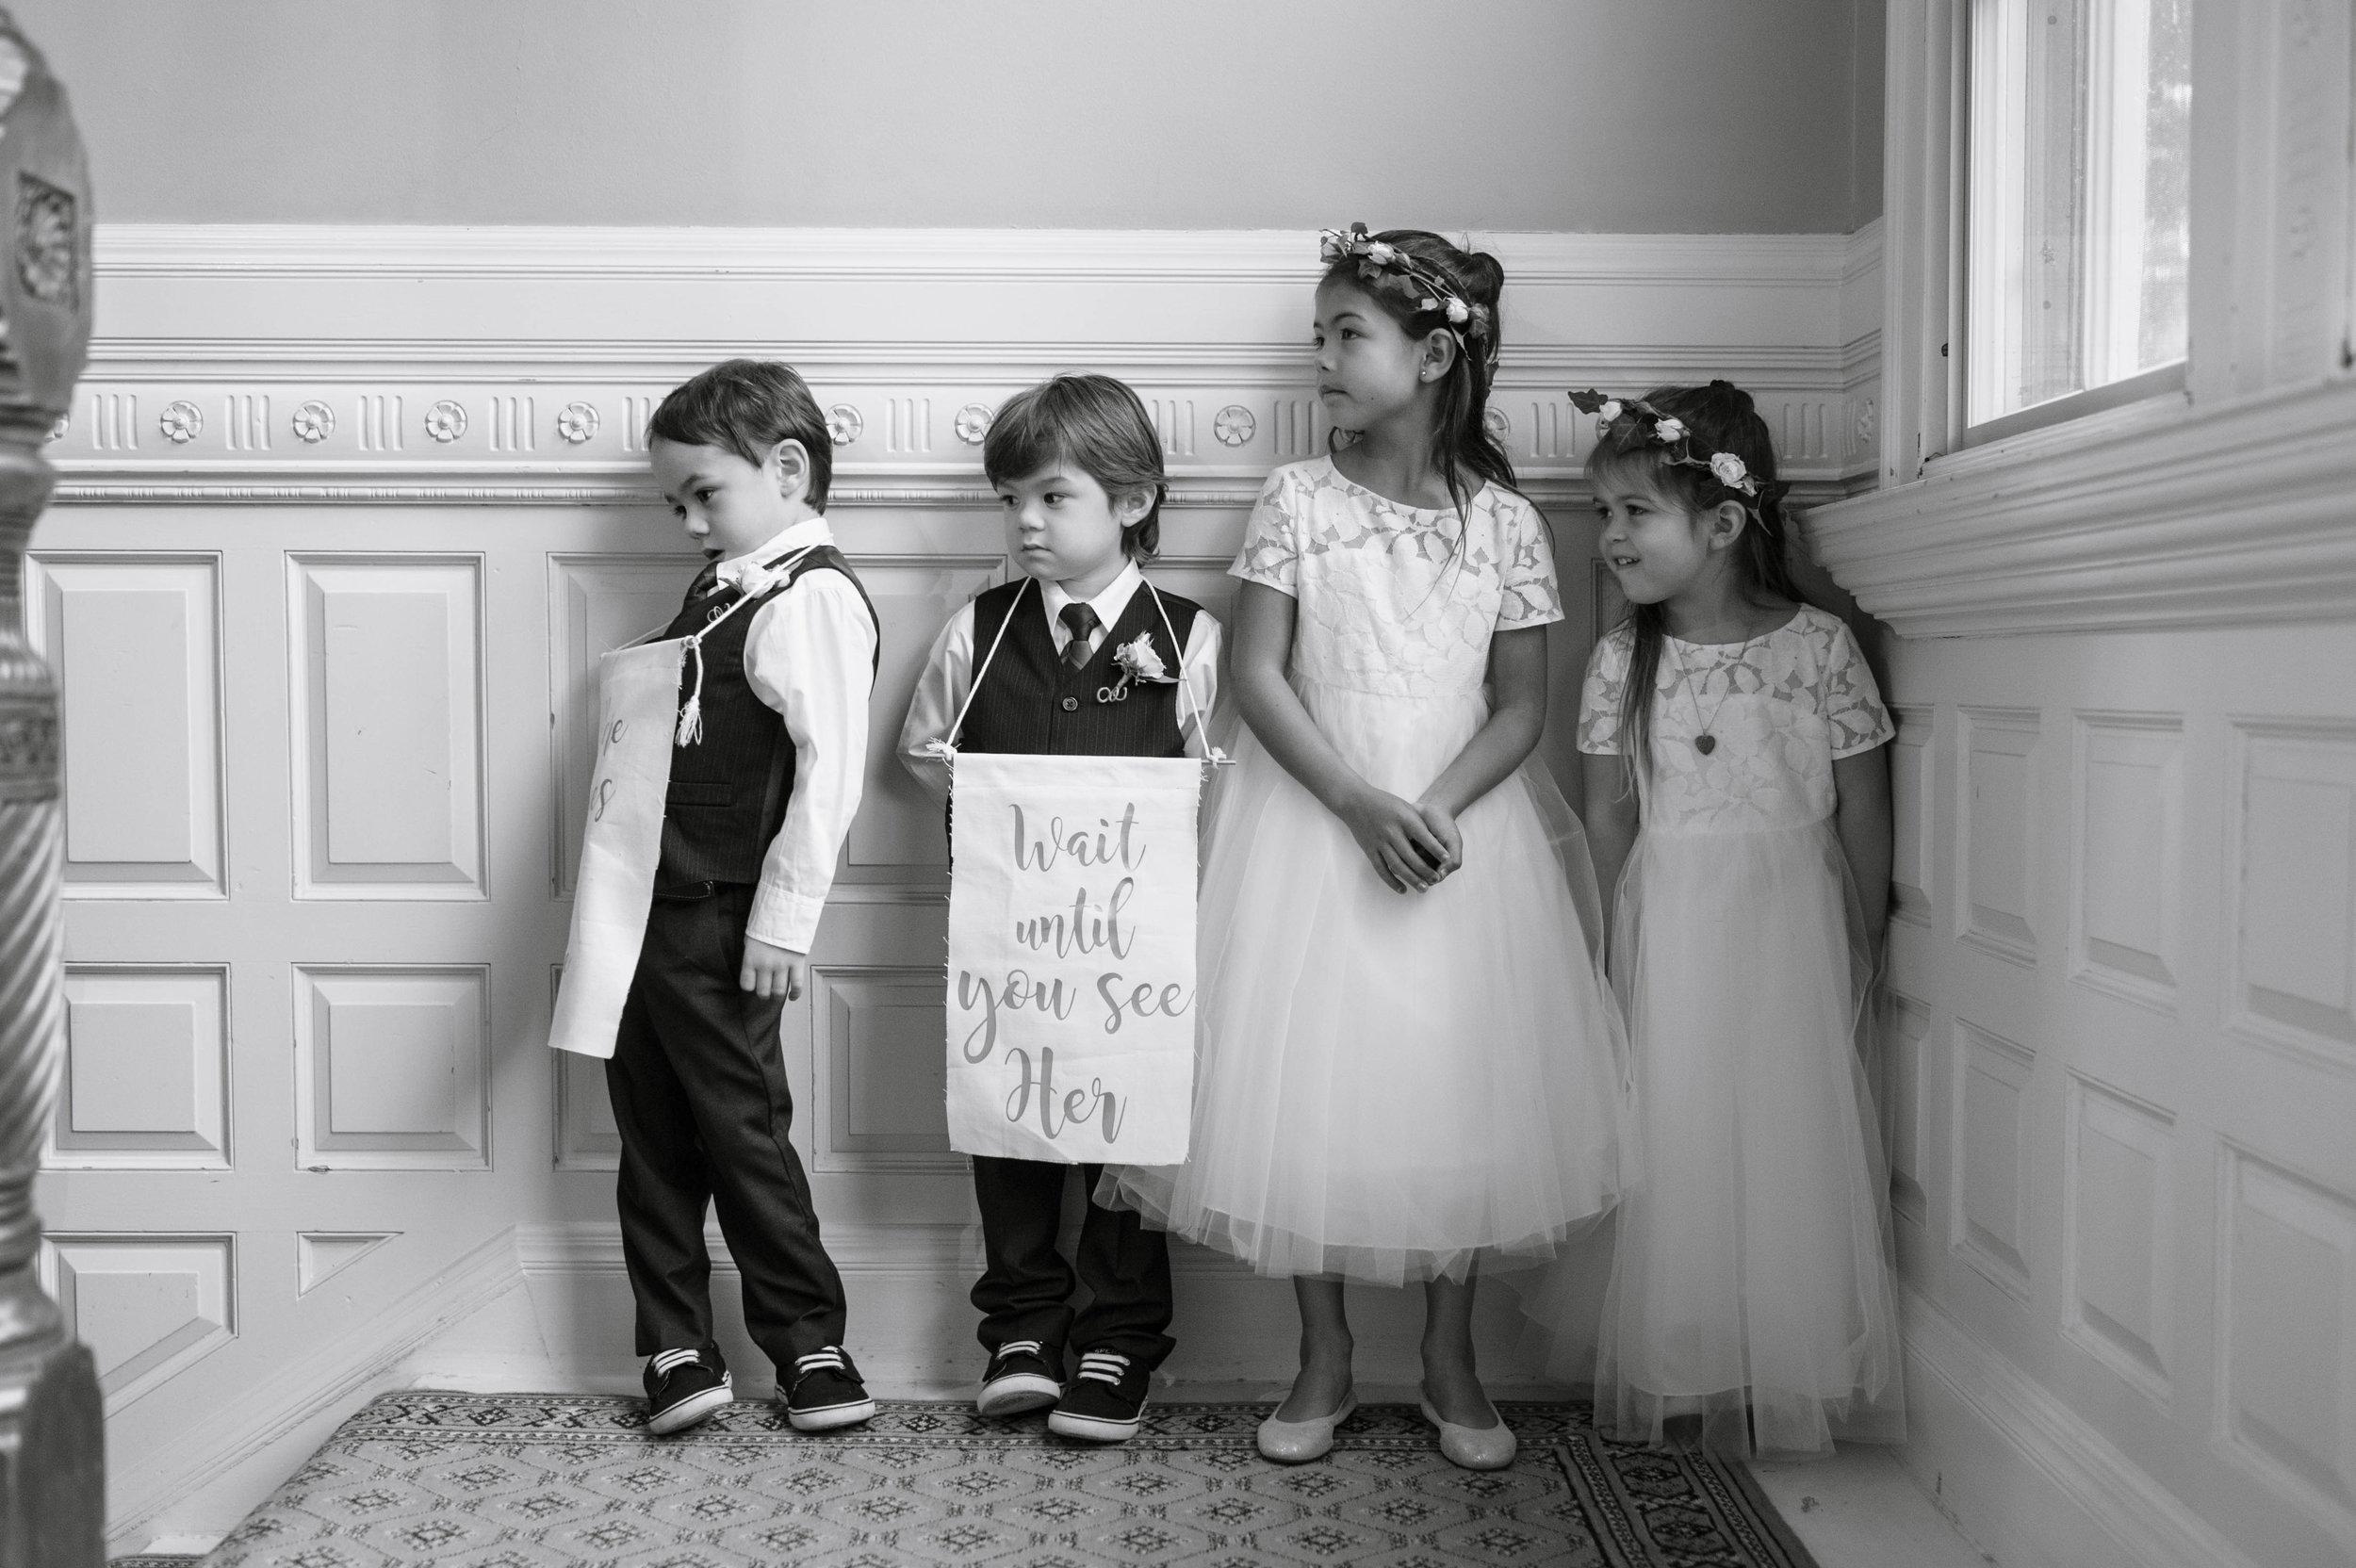 Creative-Wedding-Photography-Boston26.jpg